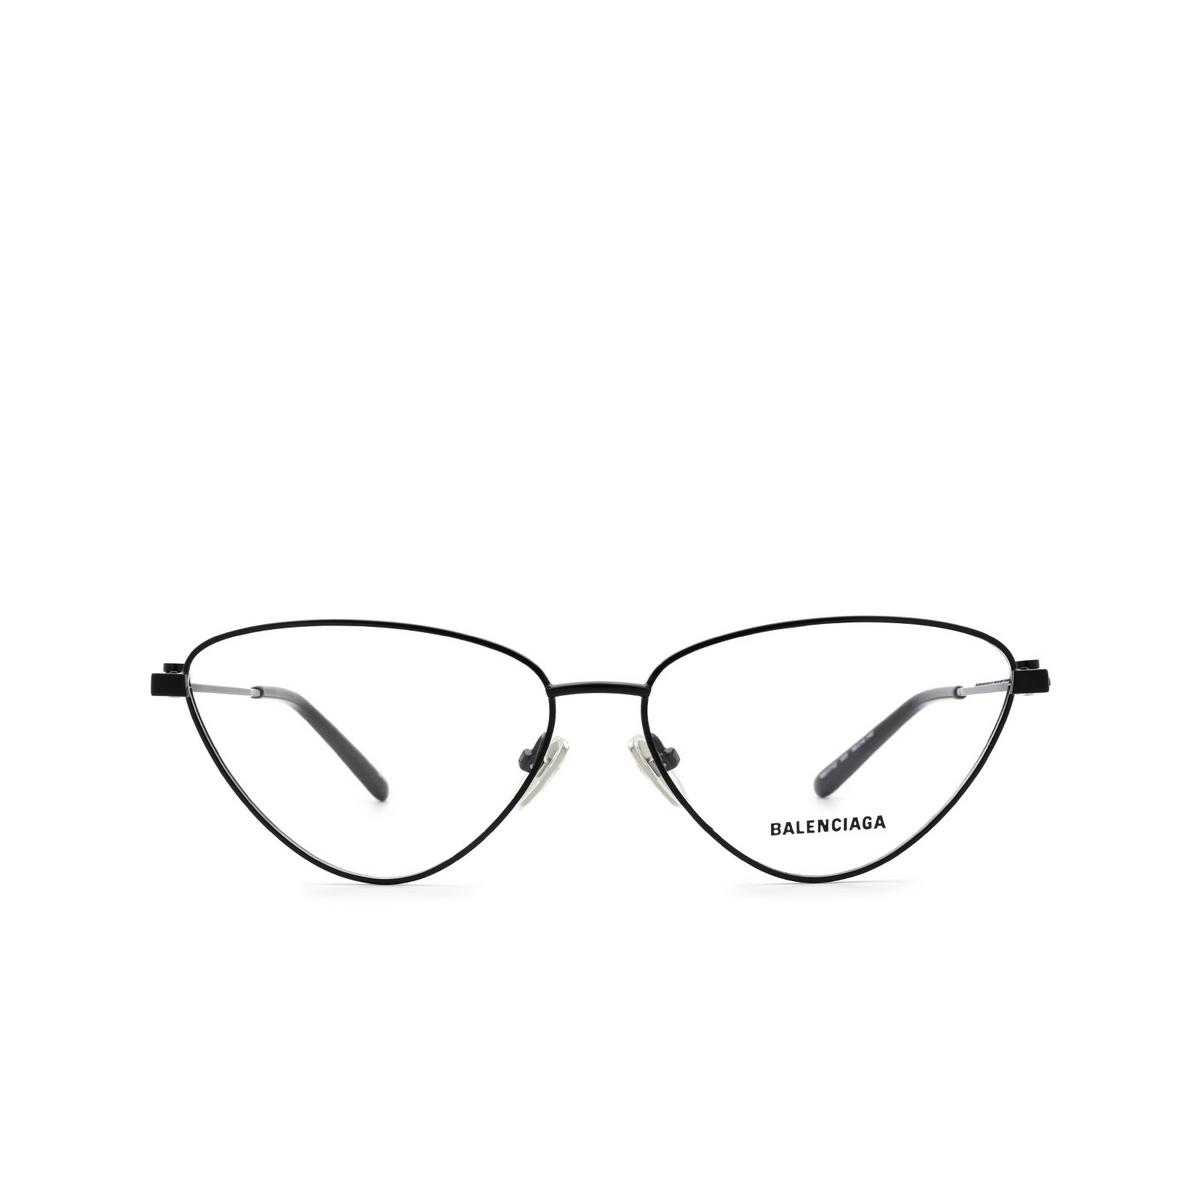 Balenciaga® Cat-eye Eyeglasses: BB0171O color Black 003 - front view.